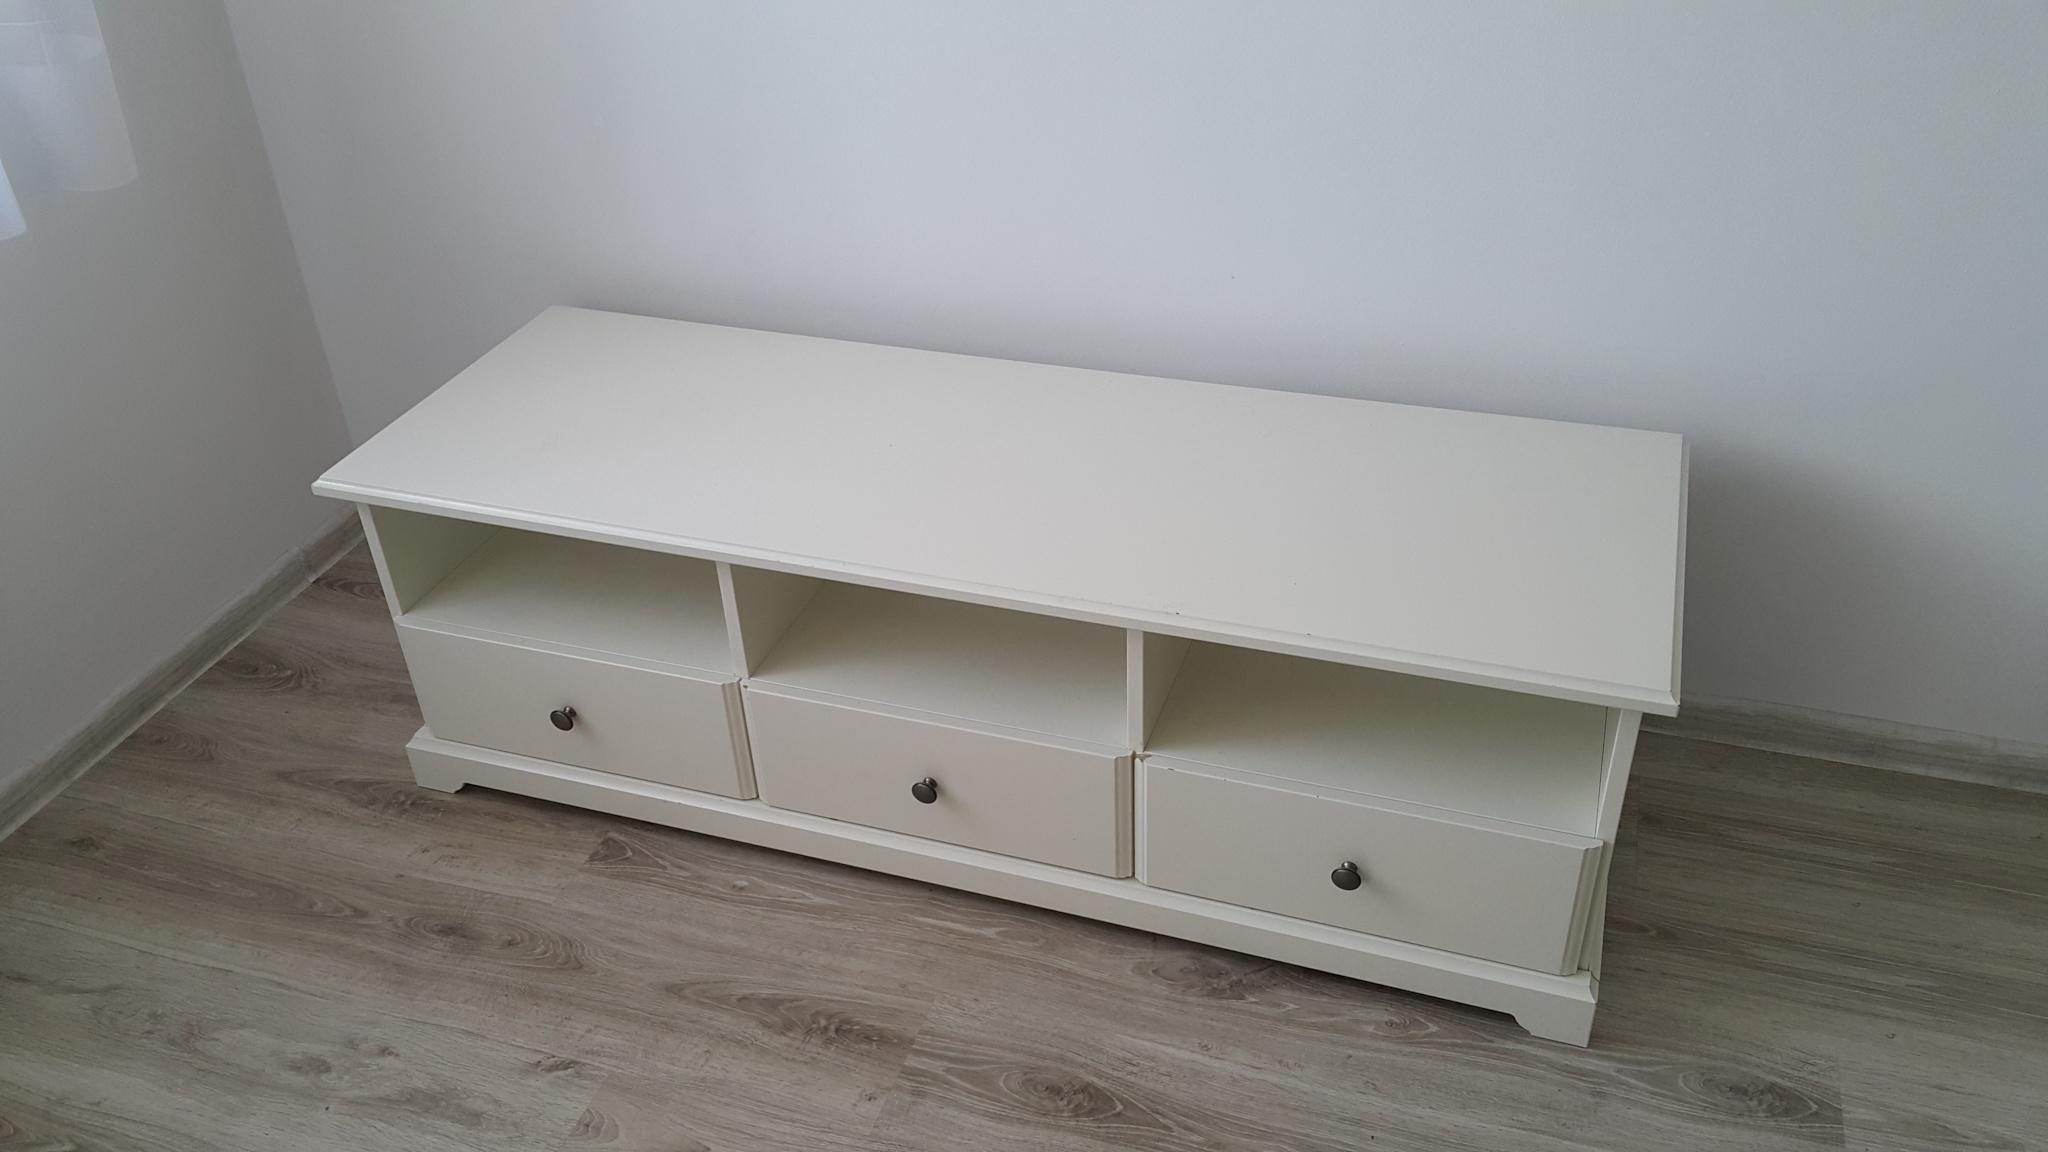 Ikea Liatorp Szafka Pod Tv